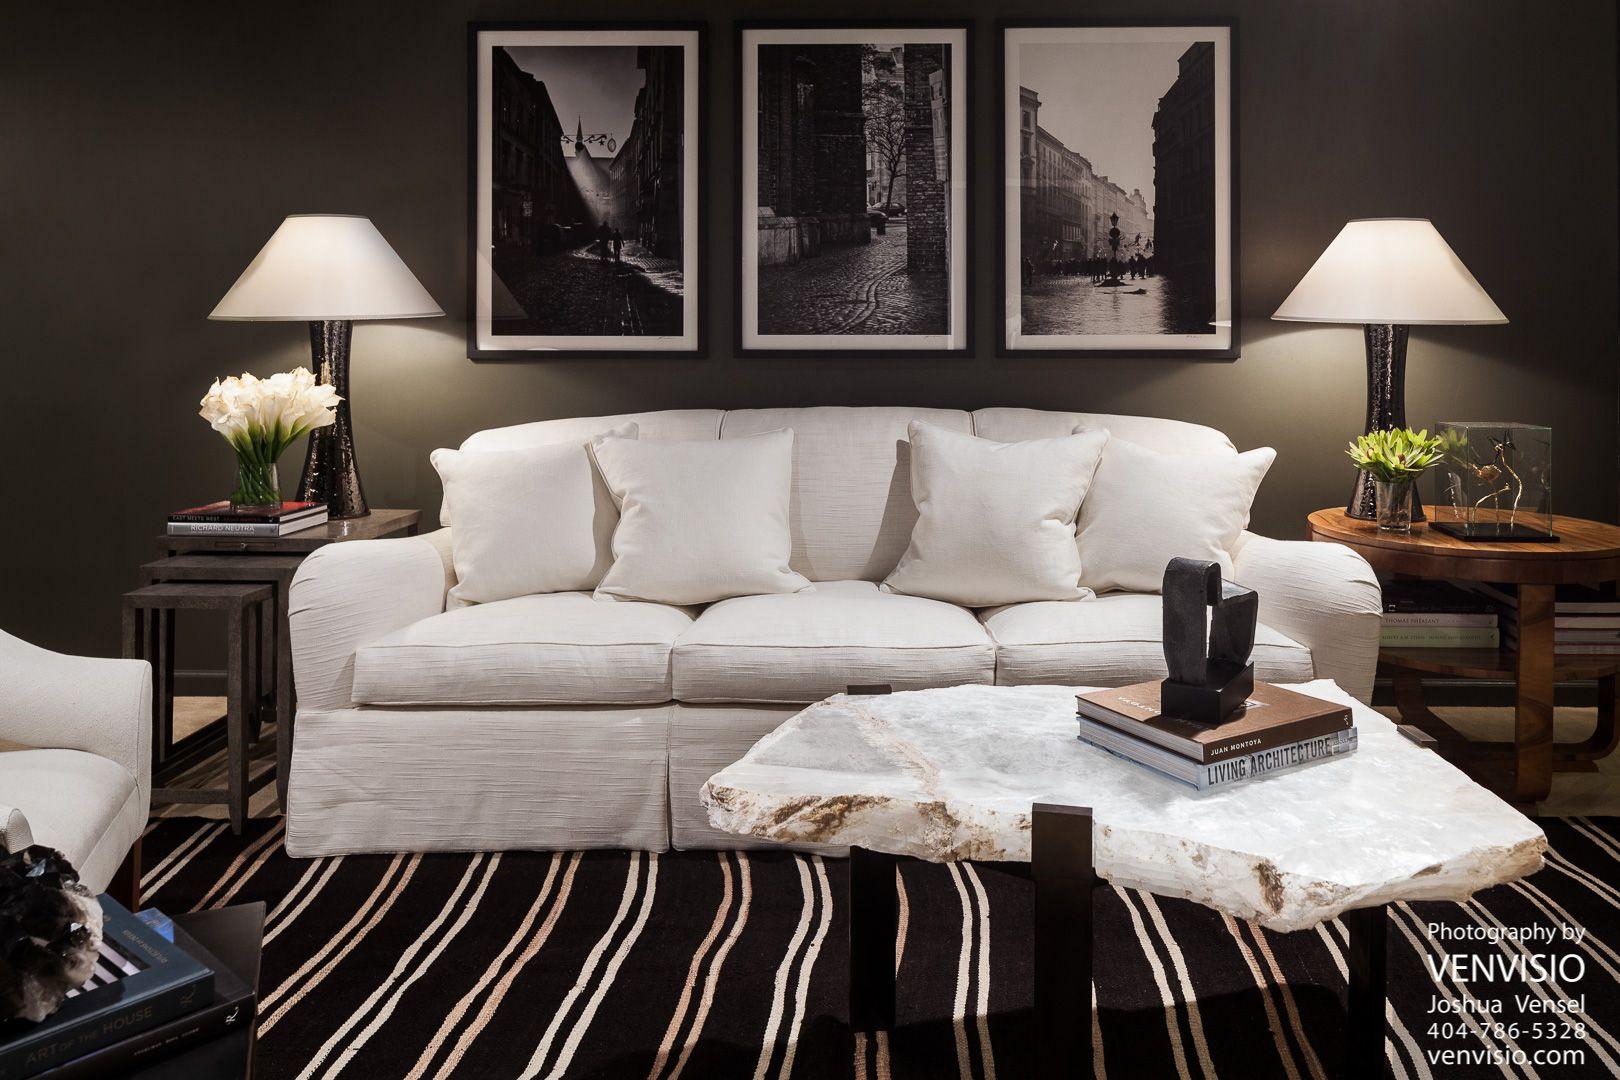 Designer barbara westbrook westbrook interiors participating showrooms jerry pair r hughes atelier sullivan fine rugs photography joshua vensel of